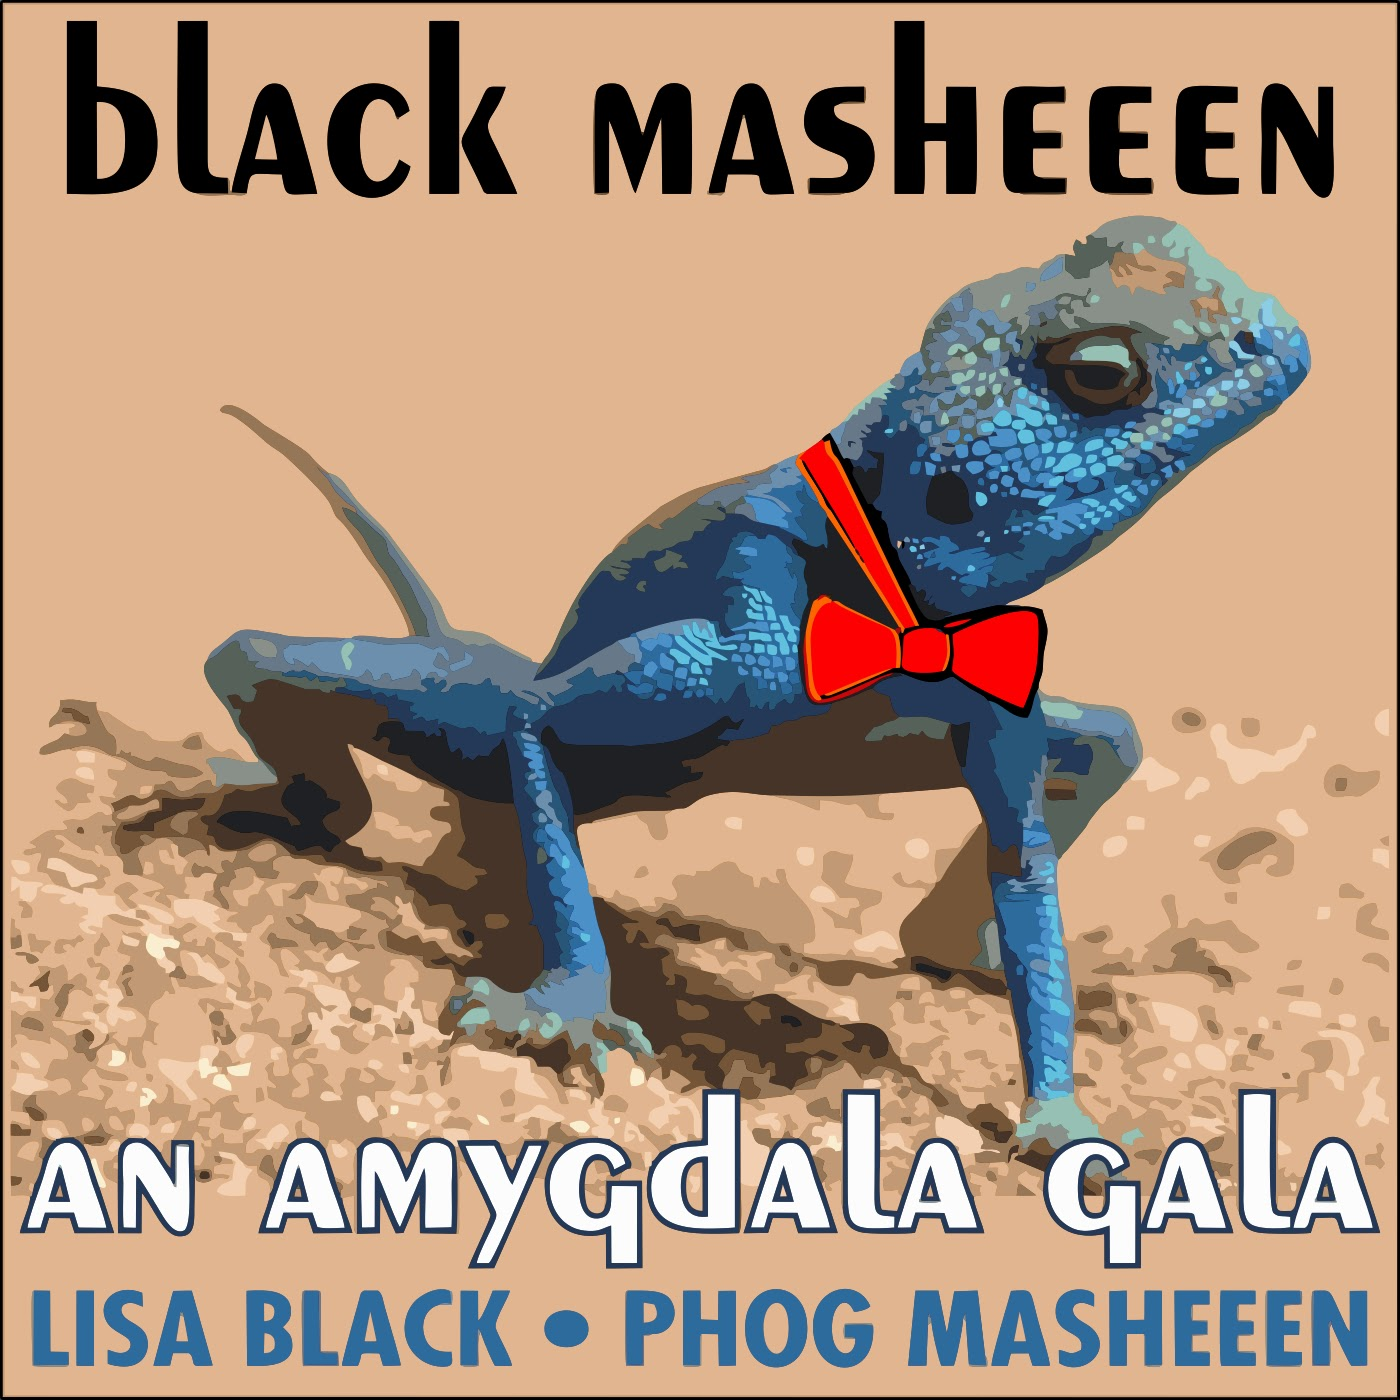 Black Masheeen: An Amygdala Gala